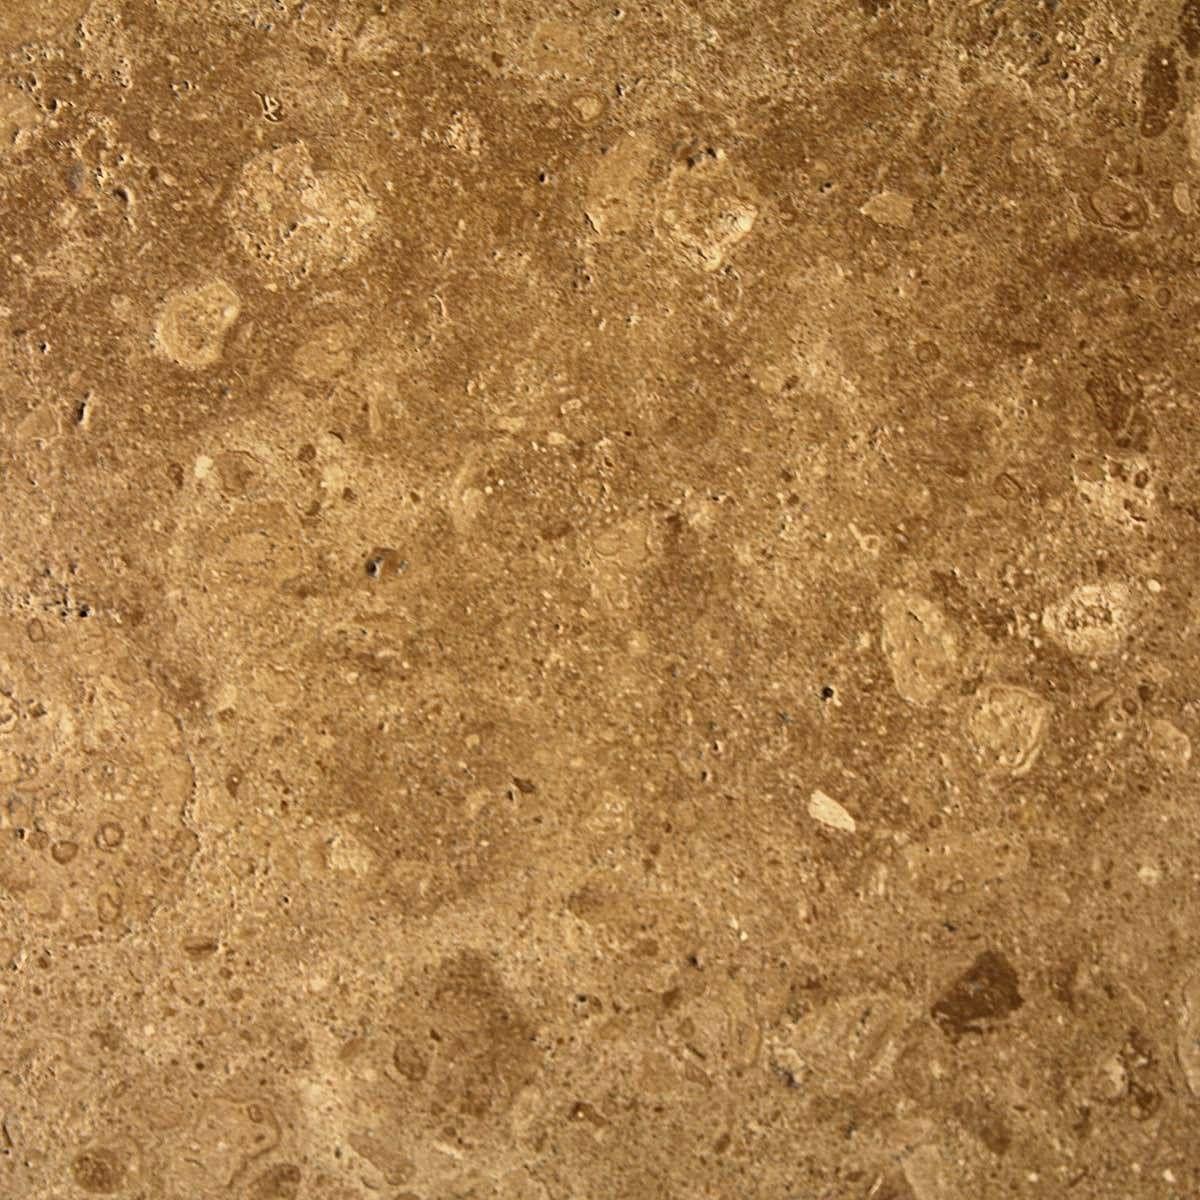 Light Brown Marble : Splotchy dark and light brown textured granite material